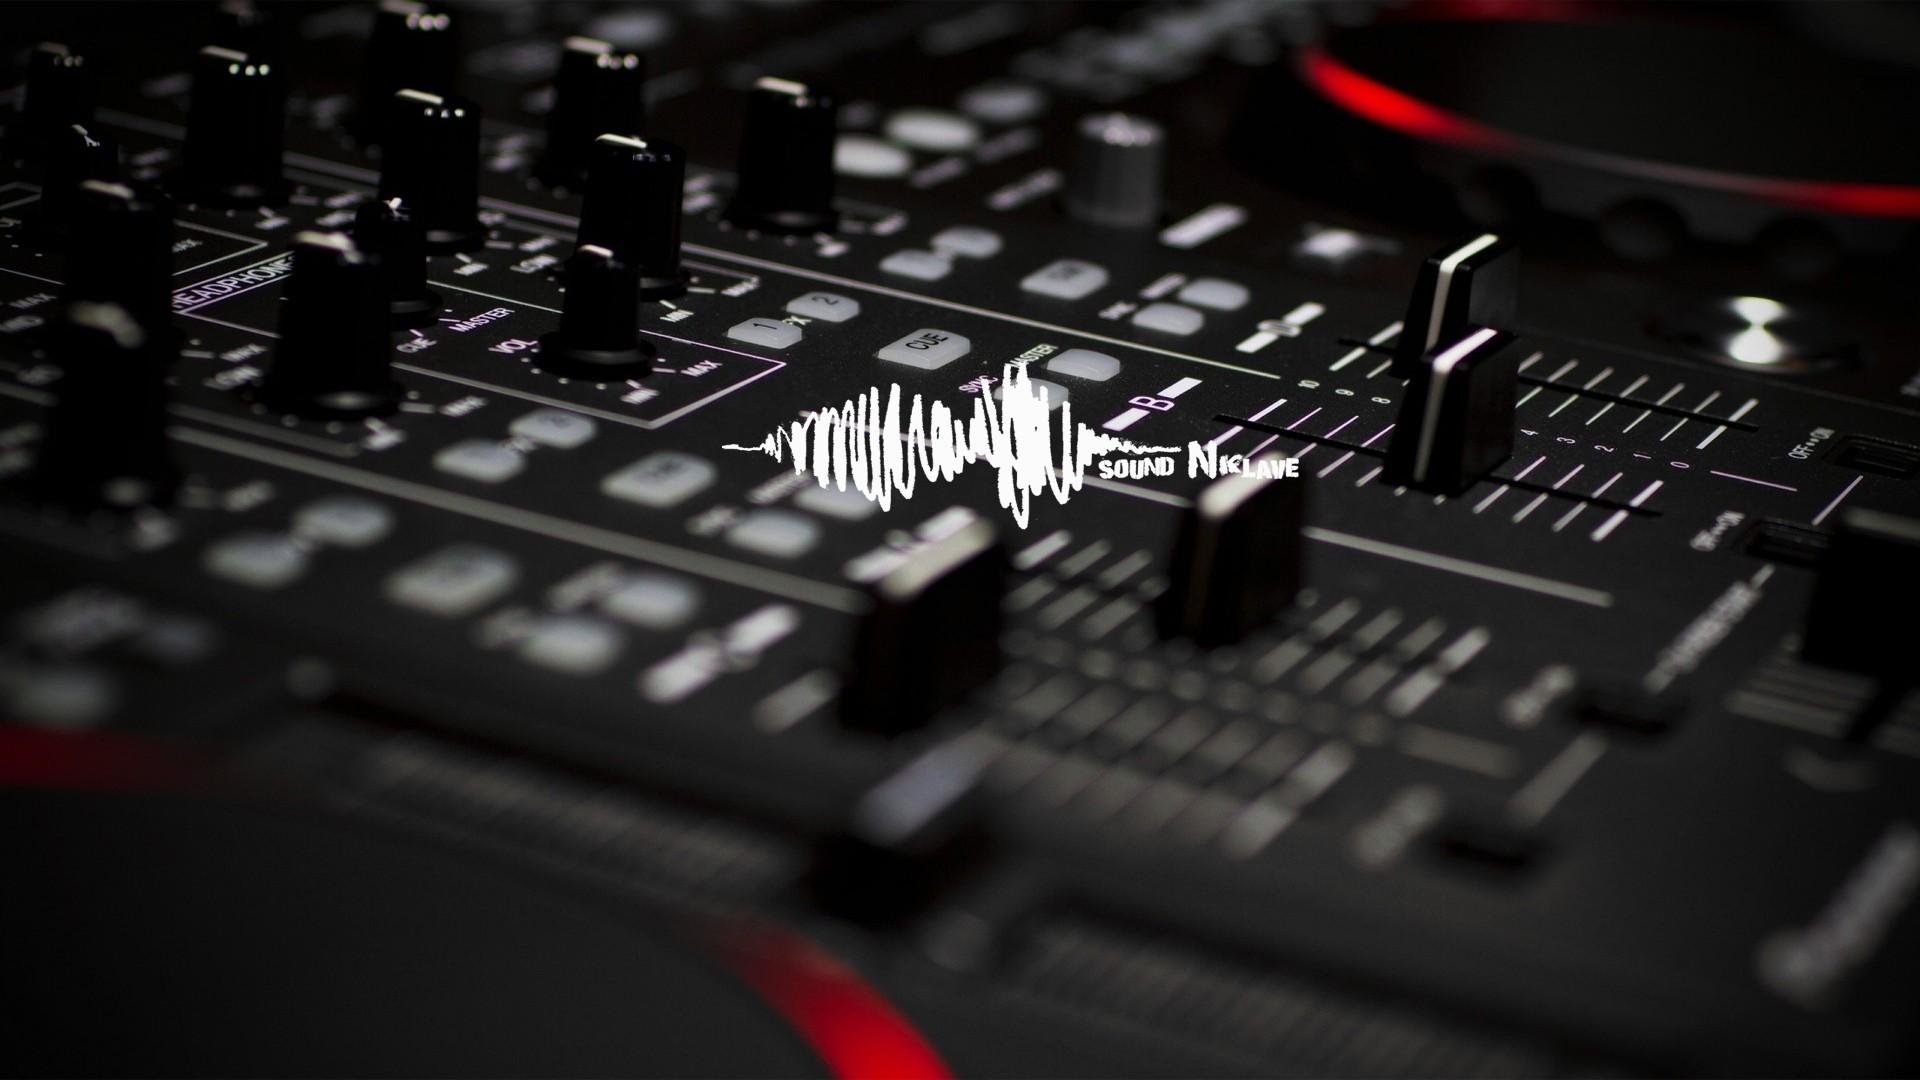 Wallpaper Techno Mixing Consoles Electronics Sound Electronic